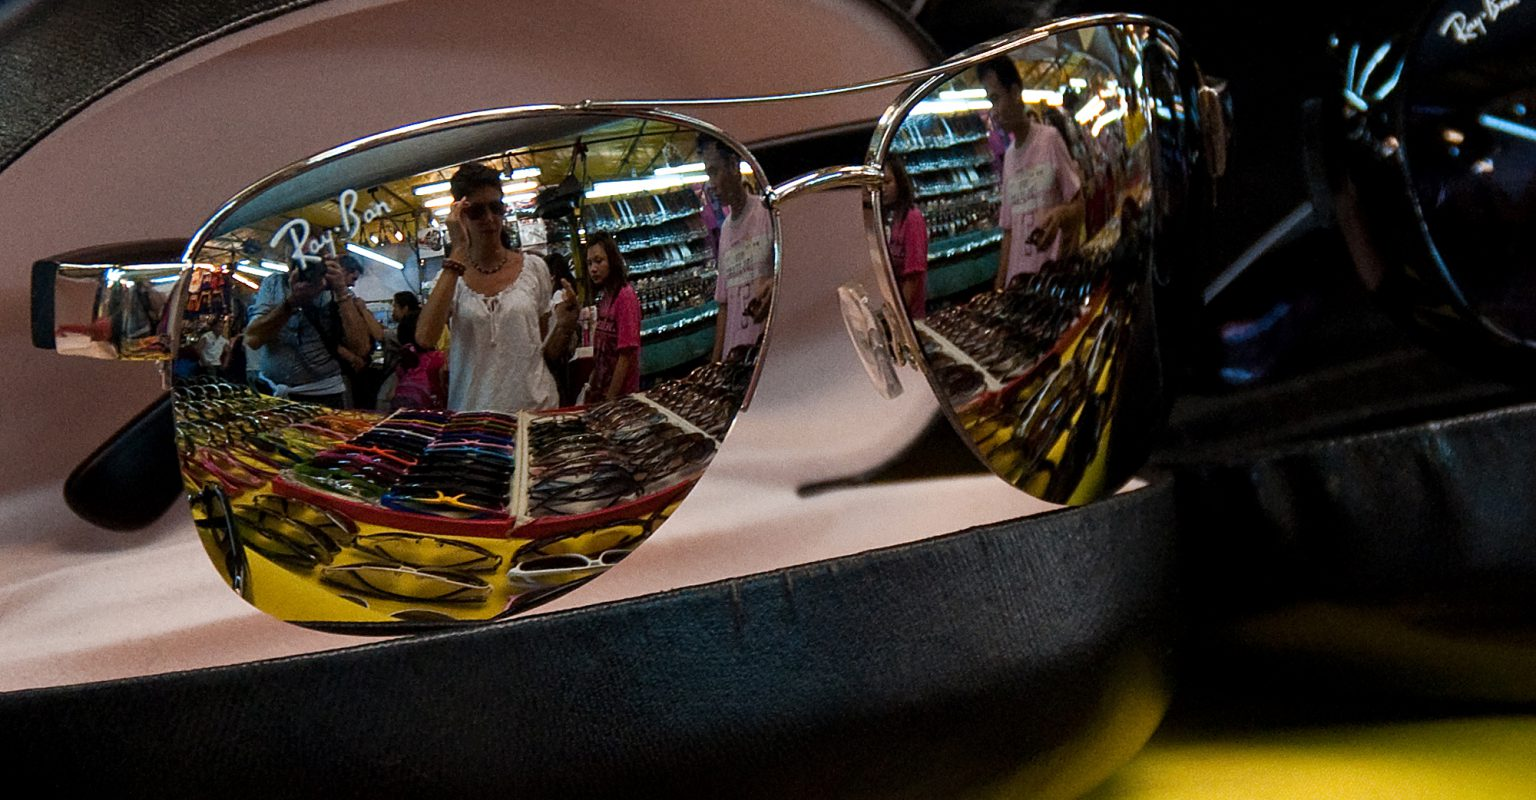 Ray-Ban zonnebril te koop op de Patpong Night Market in Bangkok